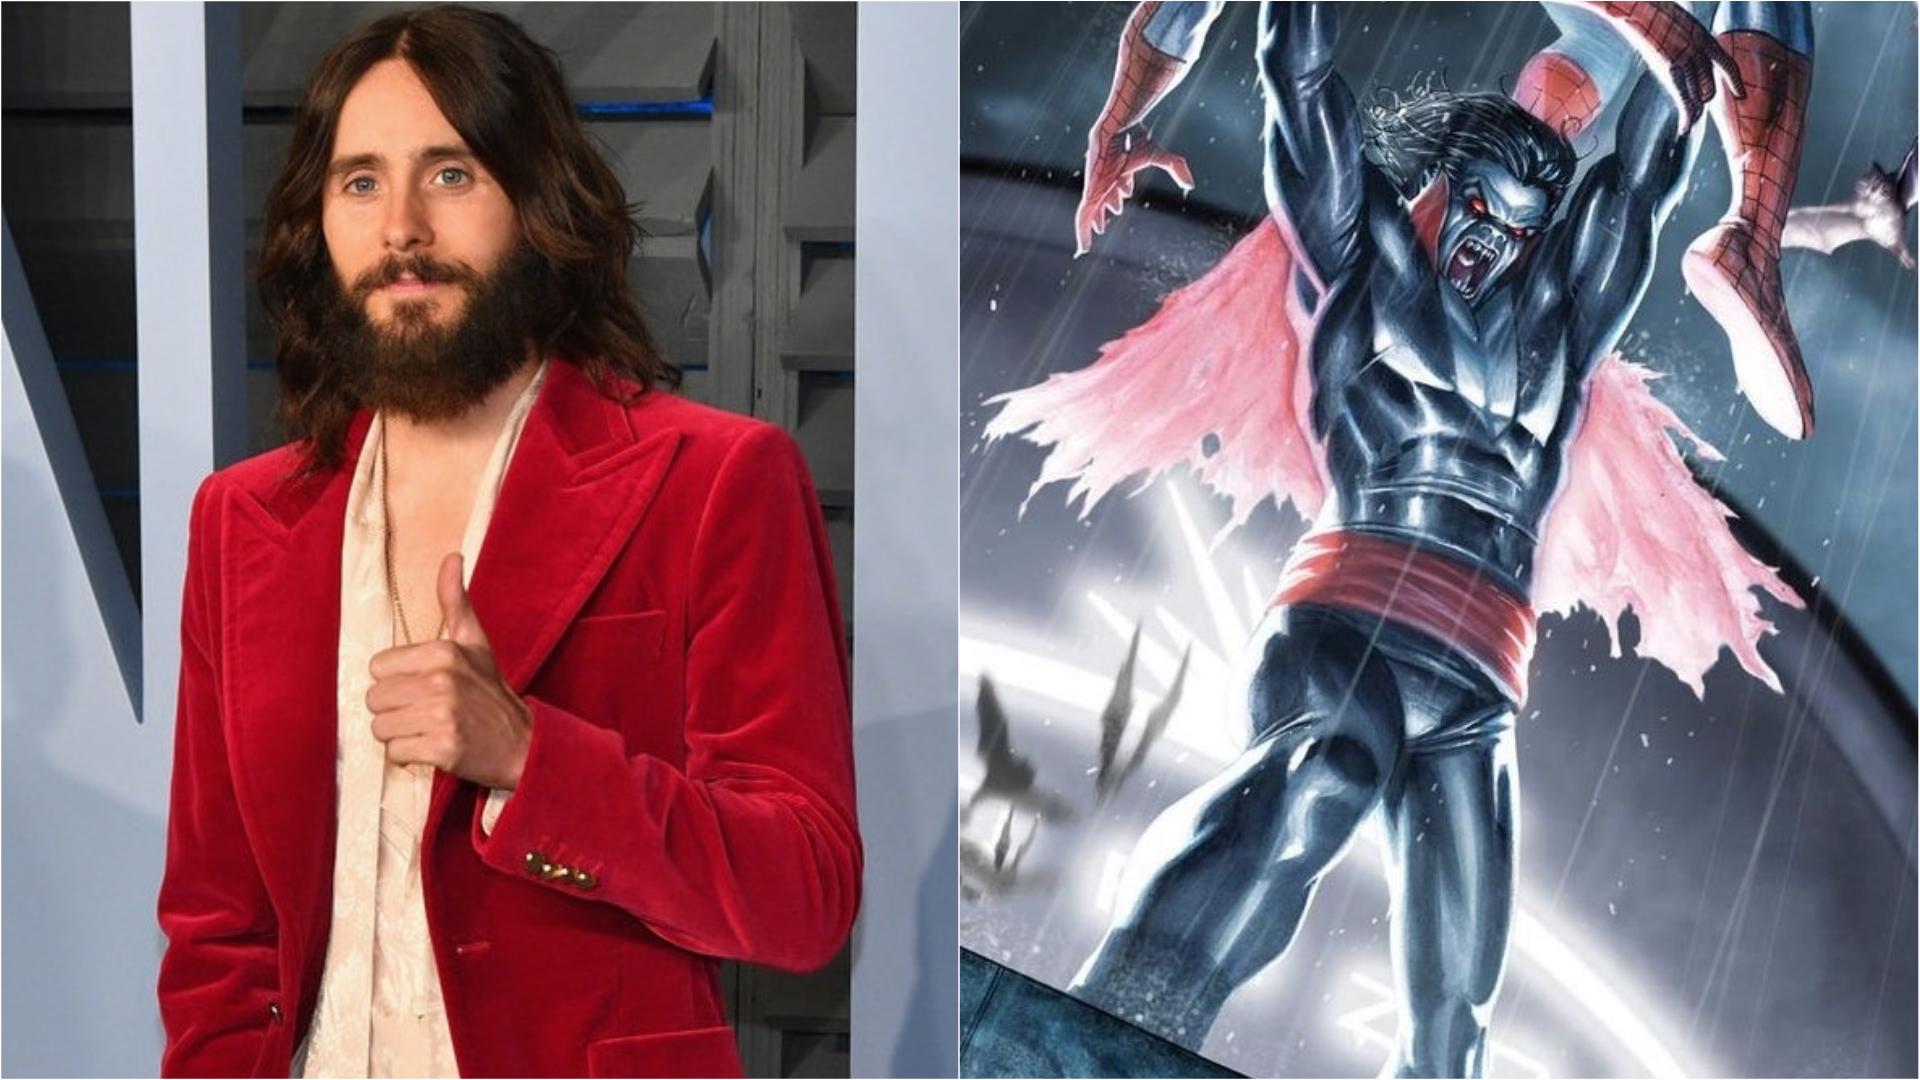 Jared Leto Morbius >> Suicide Squad Star Jared Leto Set To Star As Morbius The